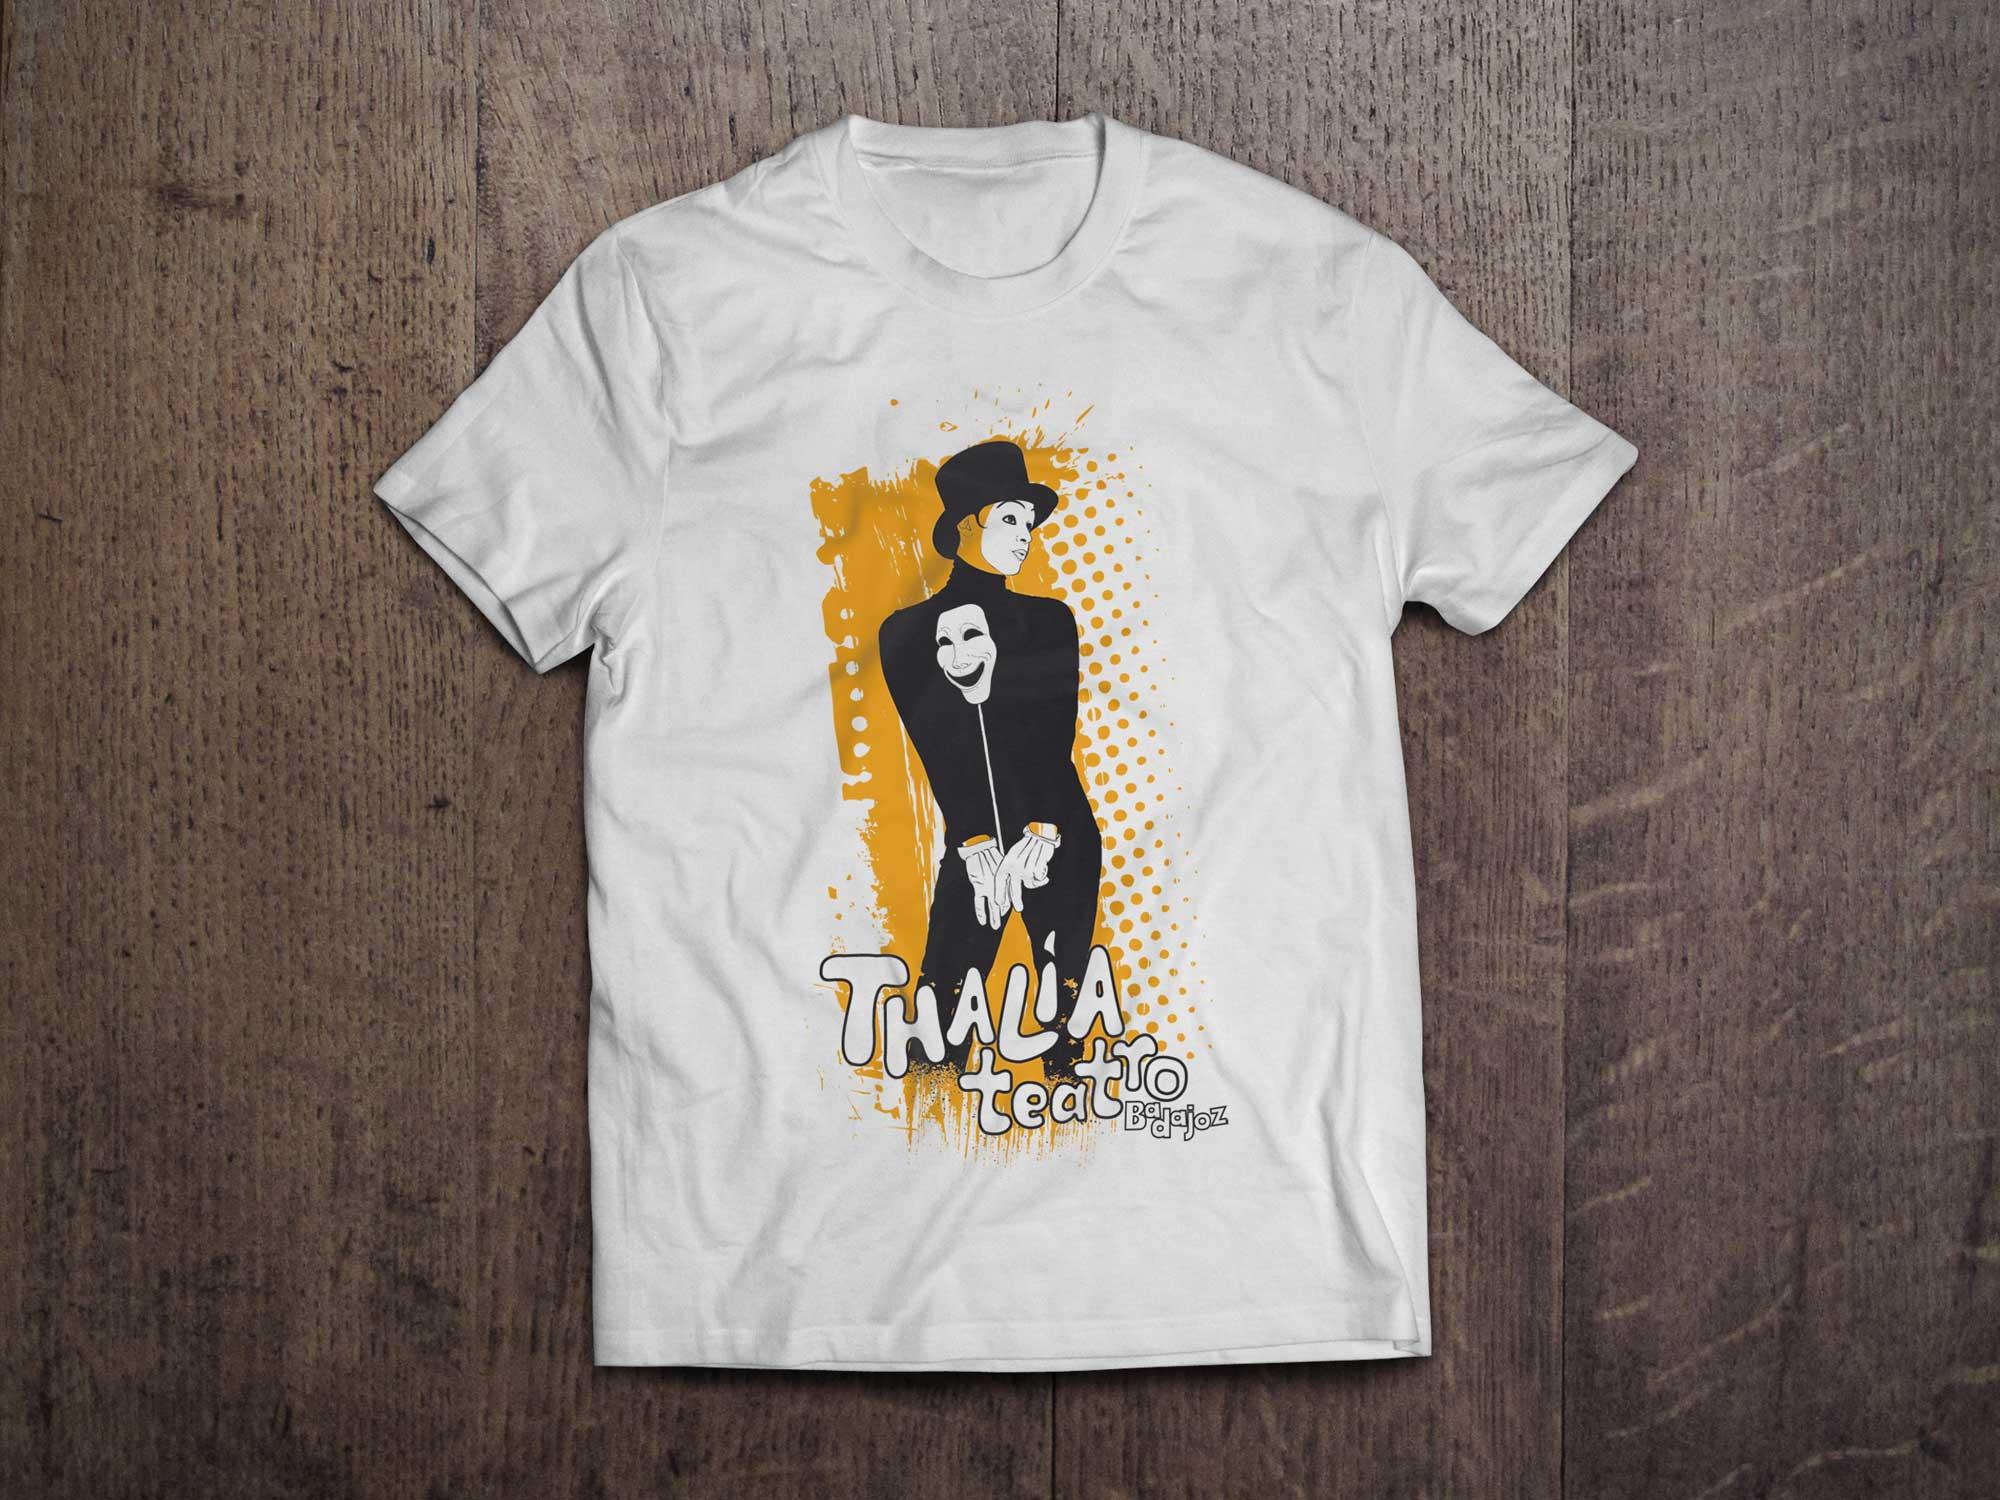 Thalía camiseta blanca